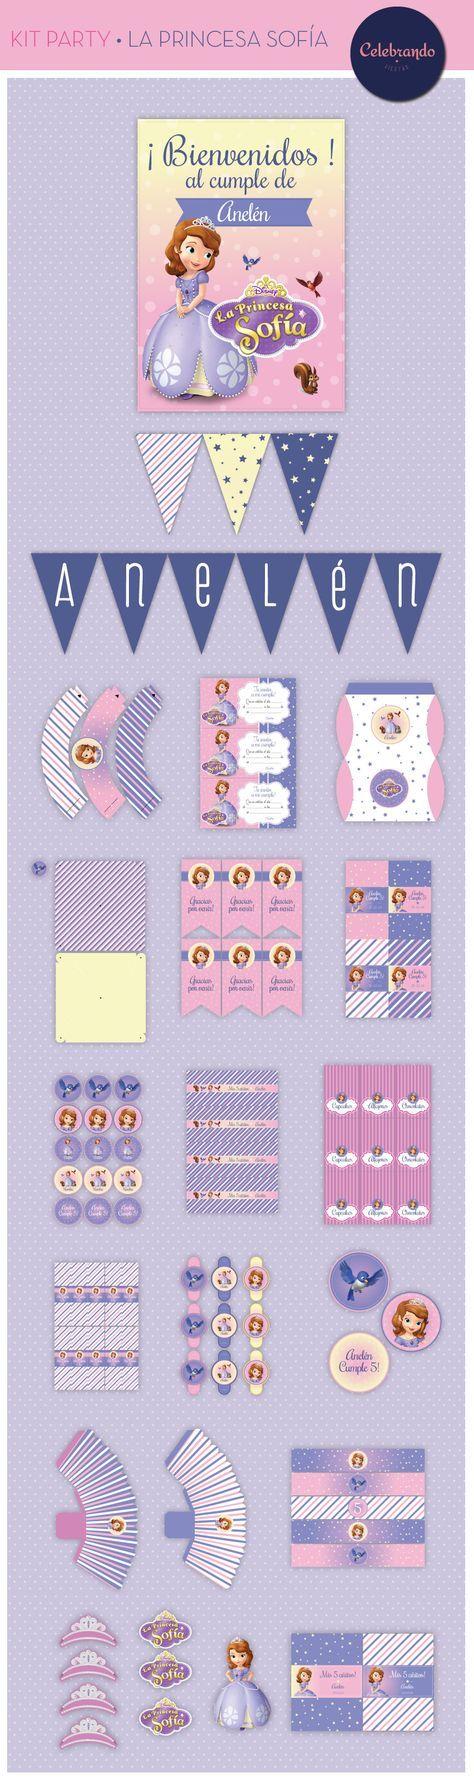 Kit imprimible Princesa Sofía - Kit Party Sofía the First. Celebrando Fiestas